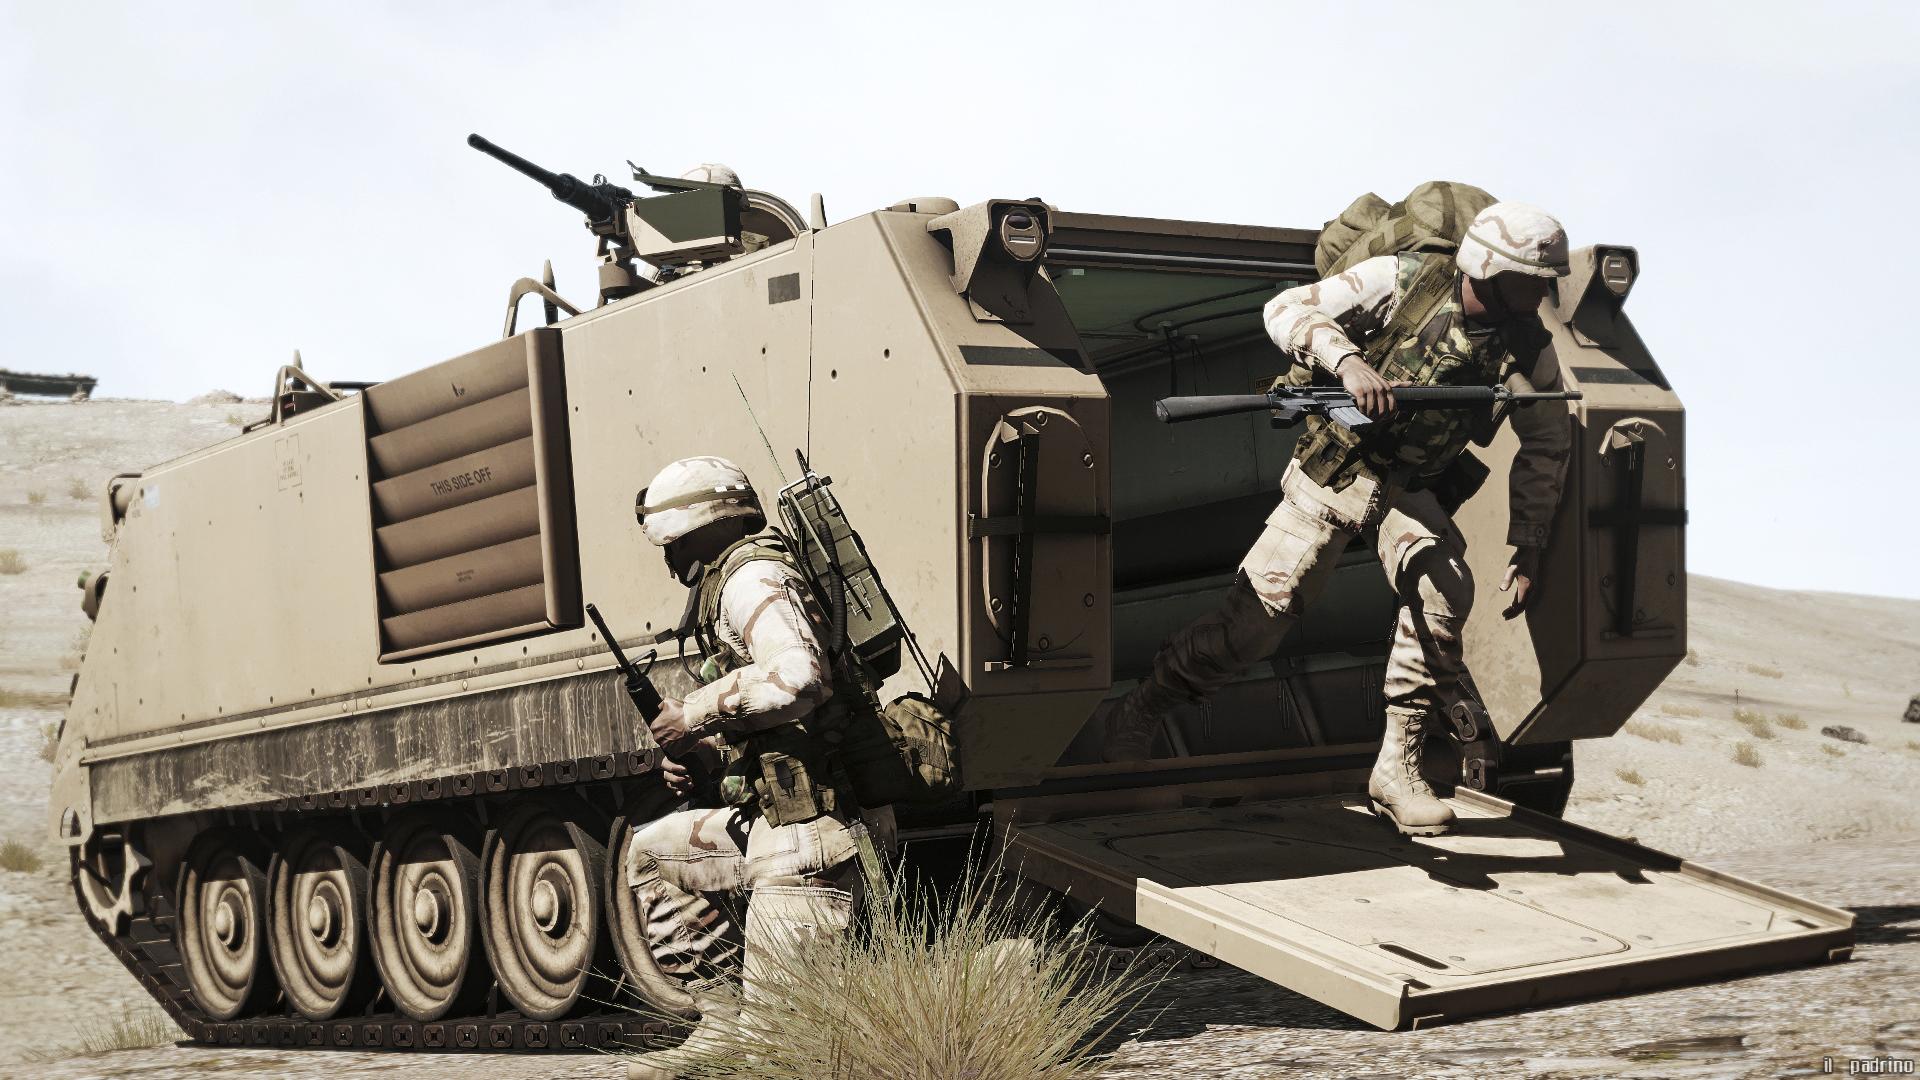 Us Military Mod 80s 90s – Fondos de Pantalla